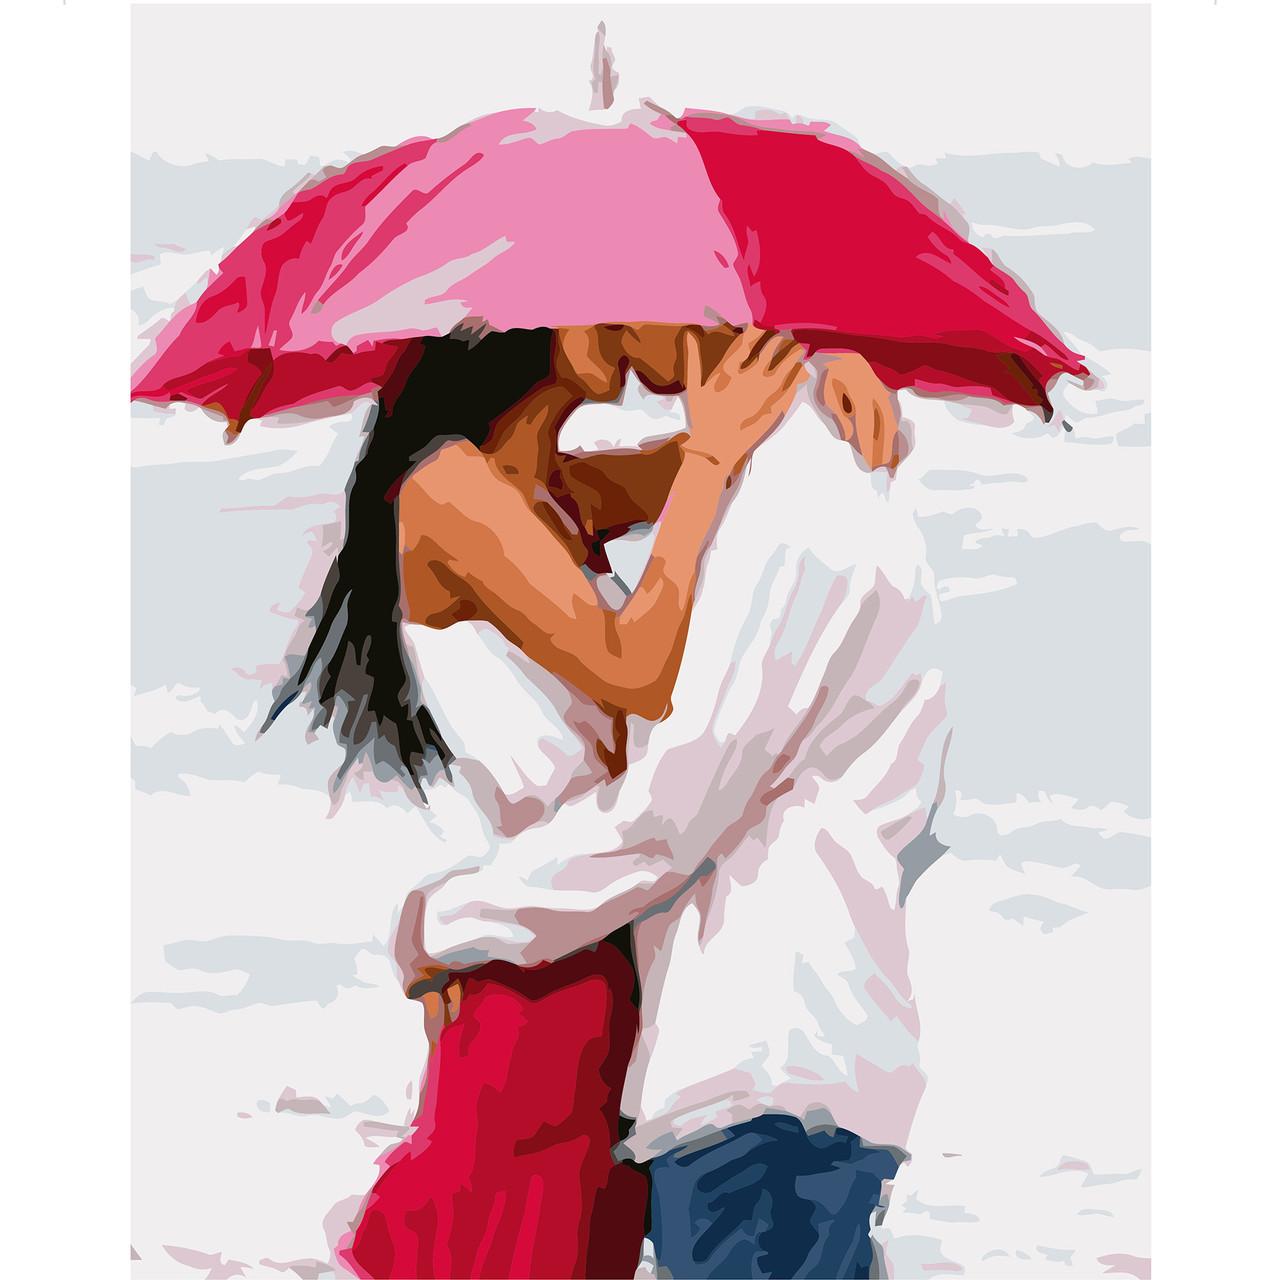 Картина по номерам VA-1575 Поцелуй под зонтом, 40х50 см Strateg